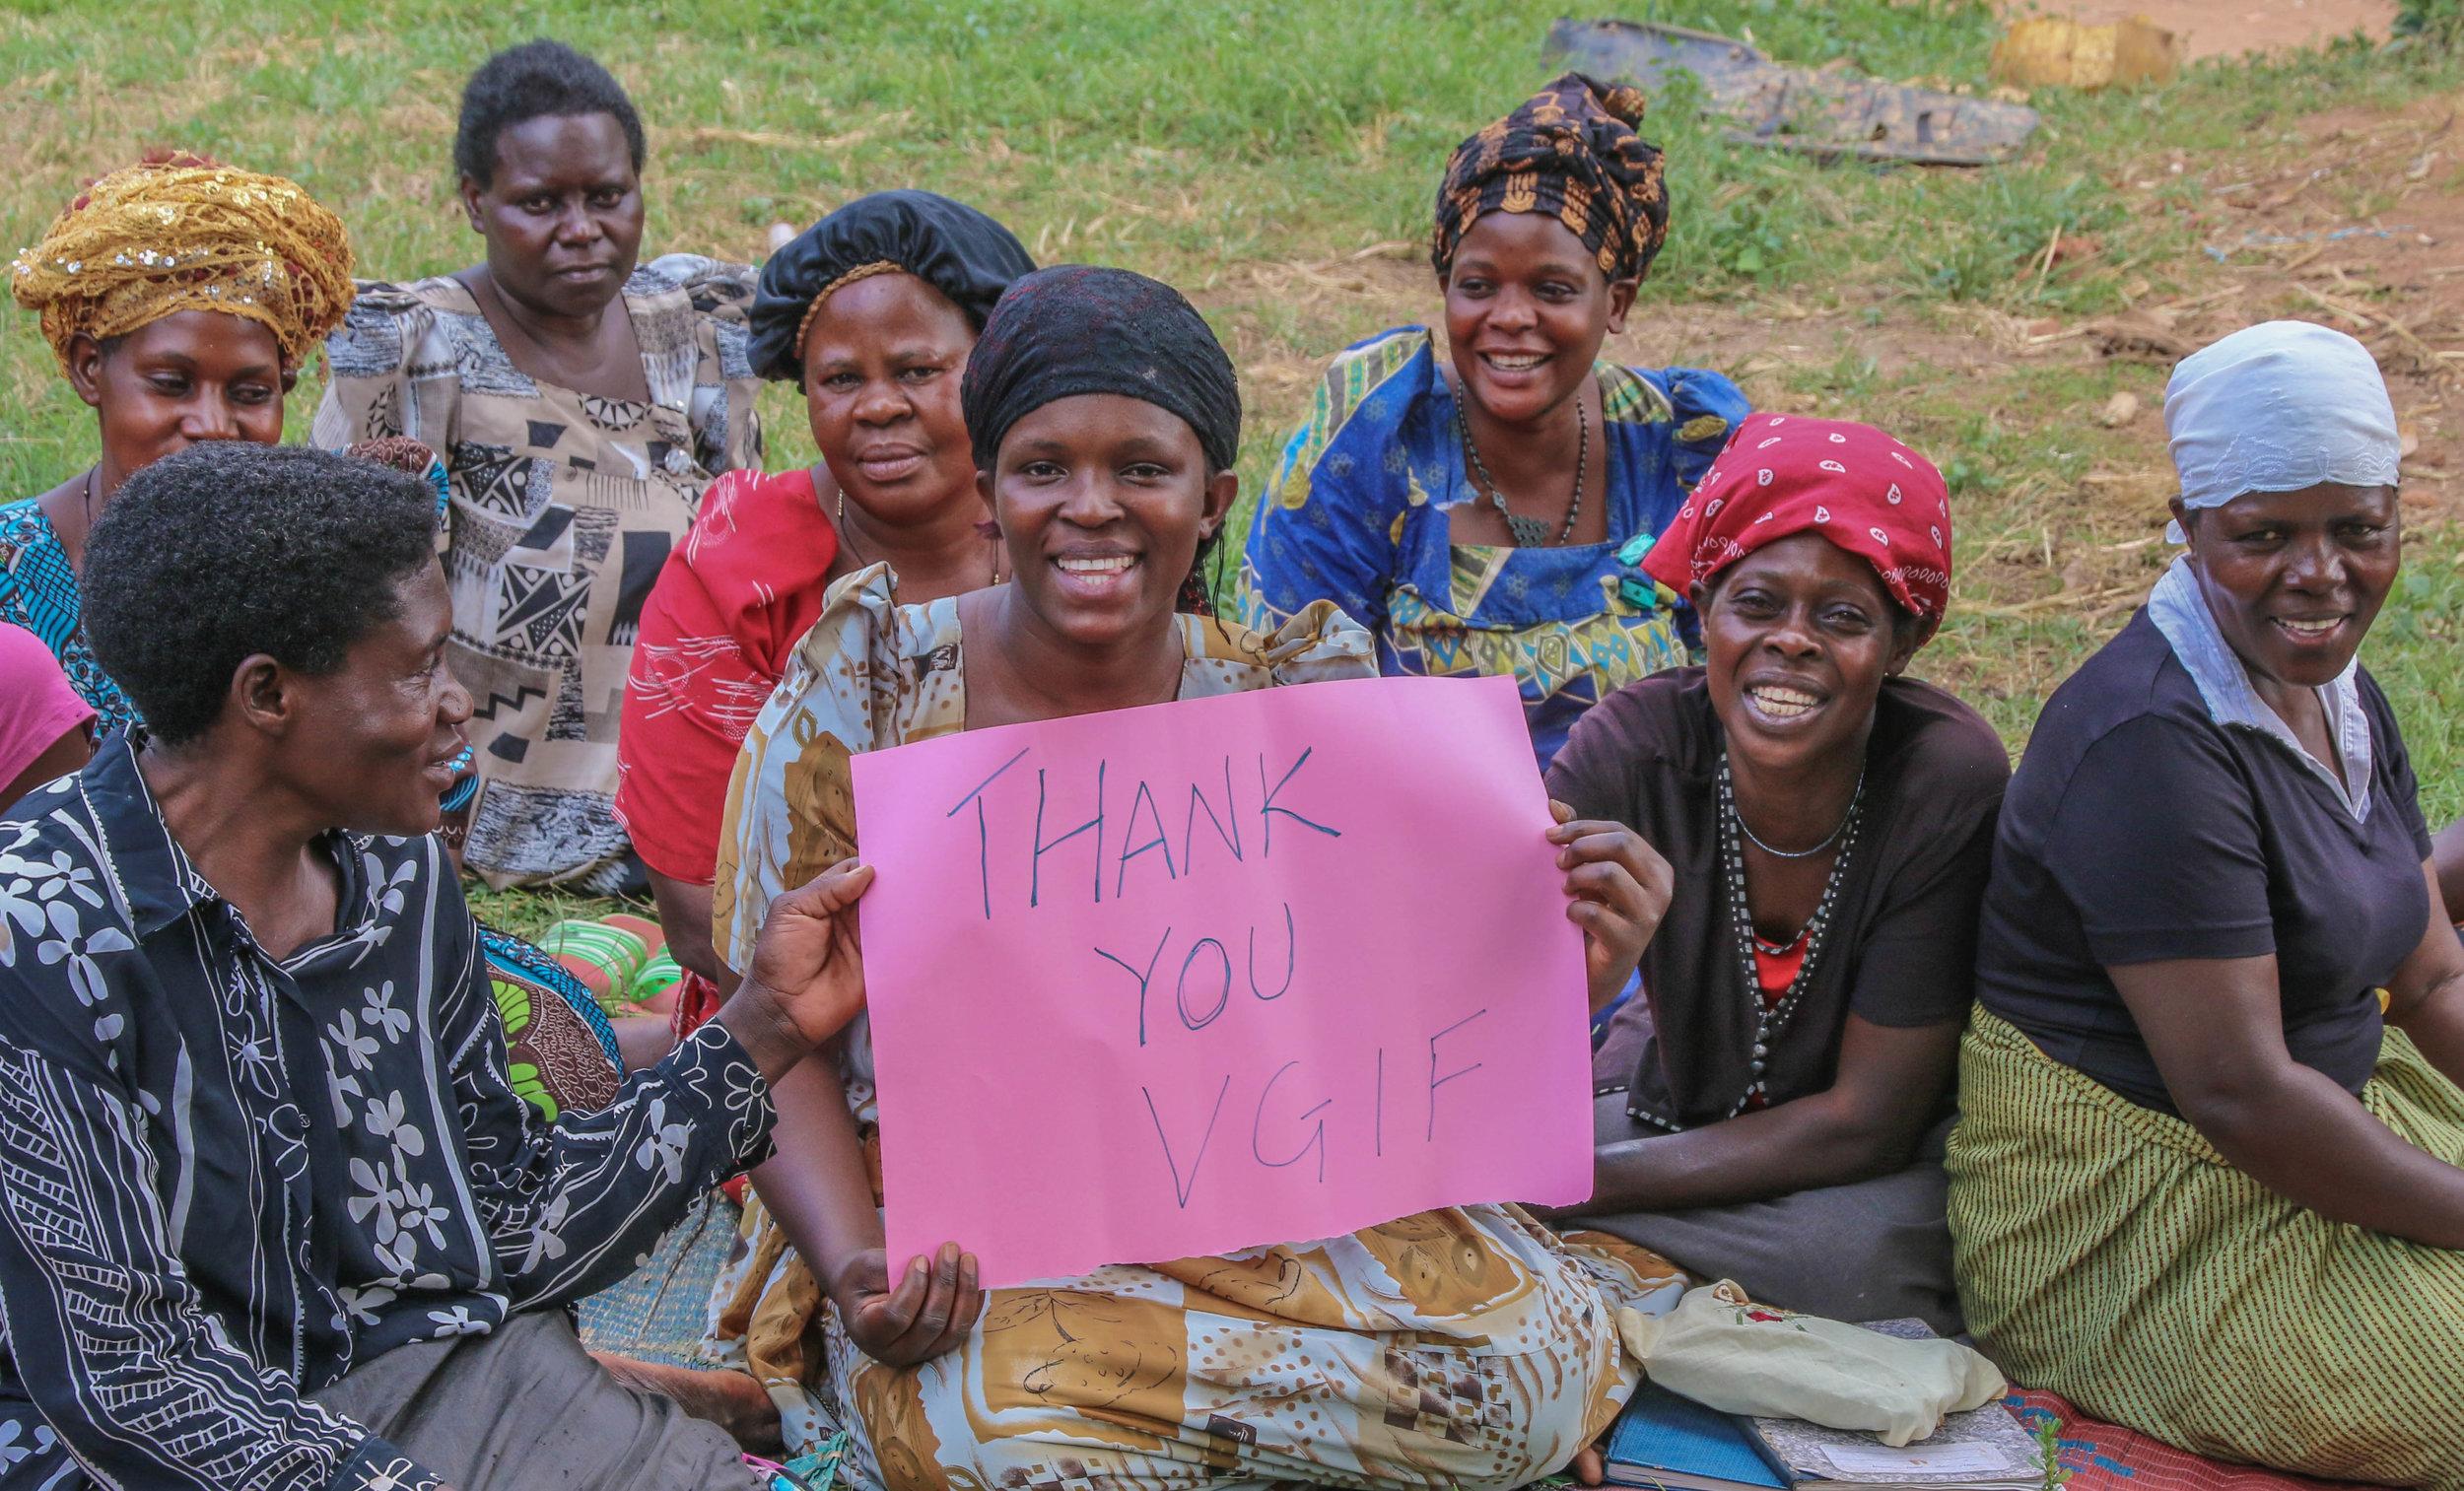 Site visit 18591 Uganda Thank you VGIF sign (1).jpg